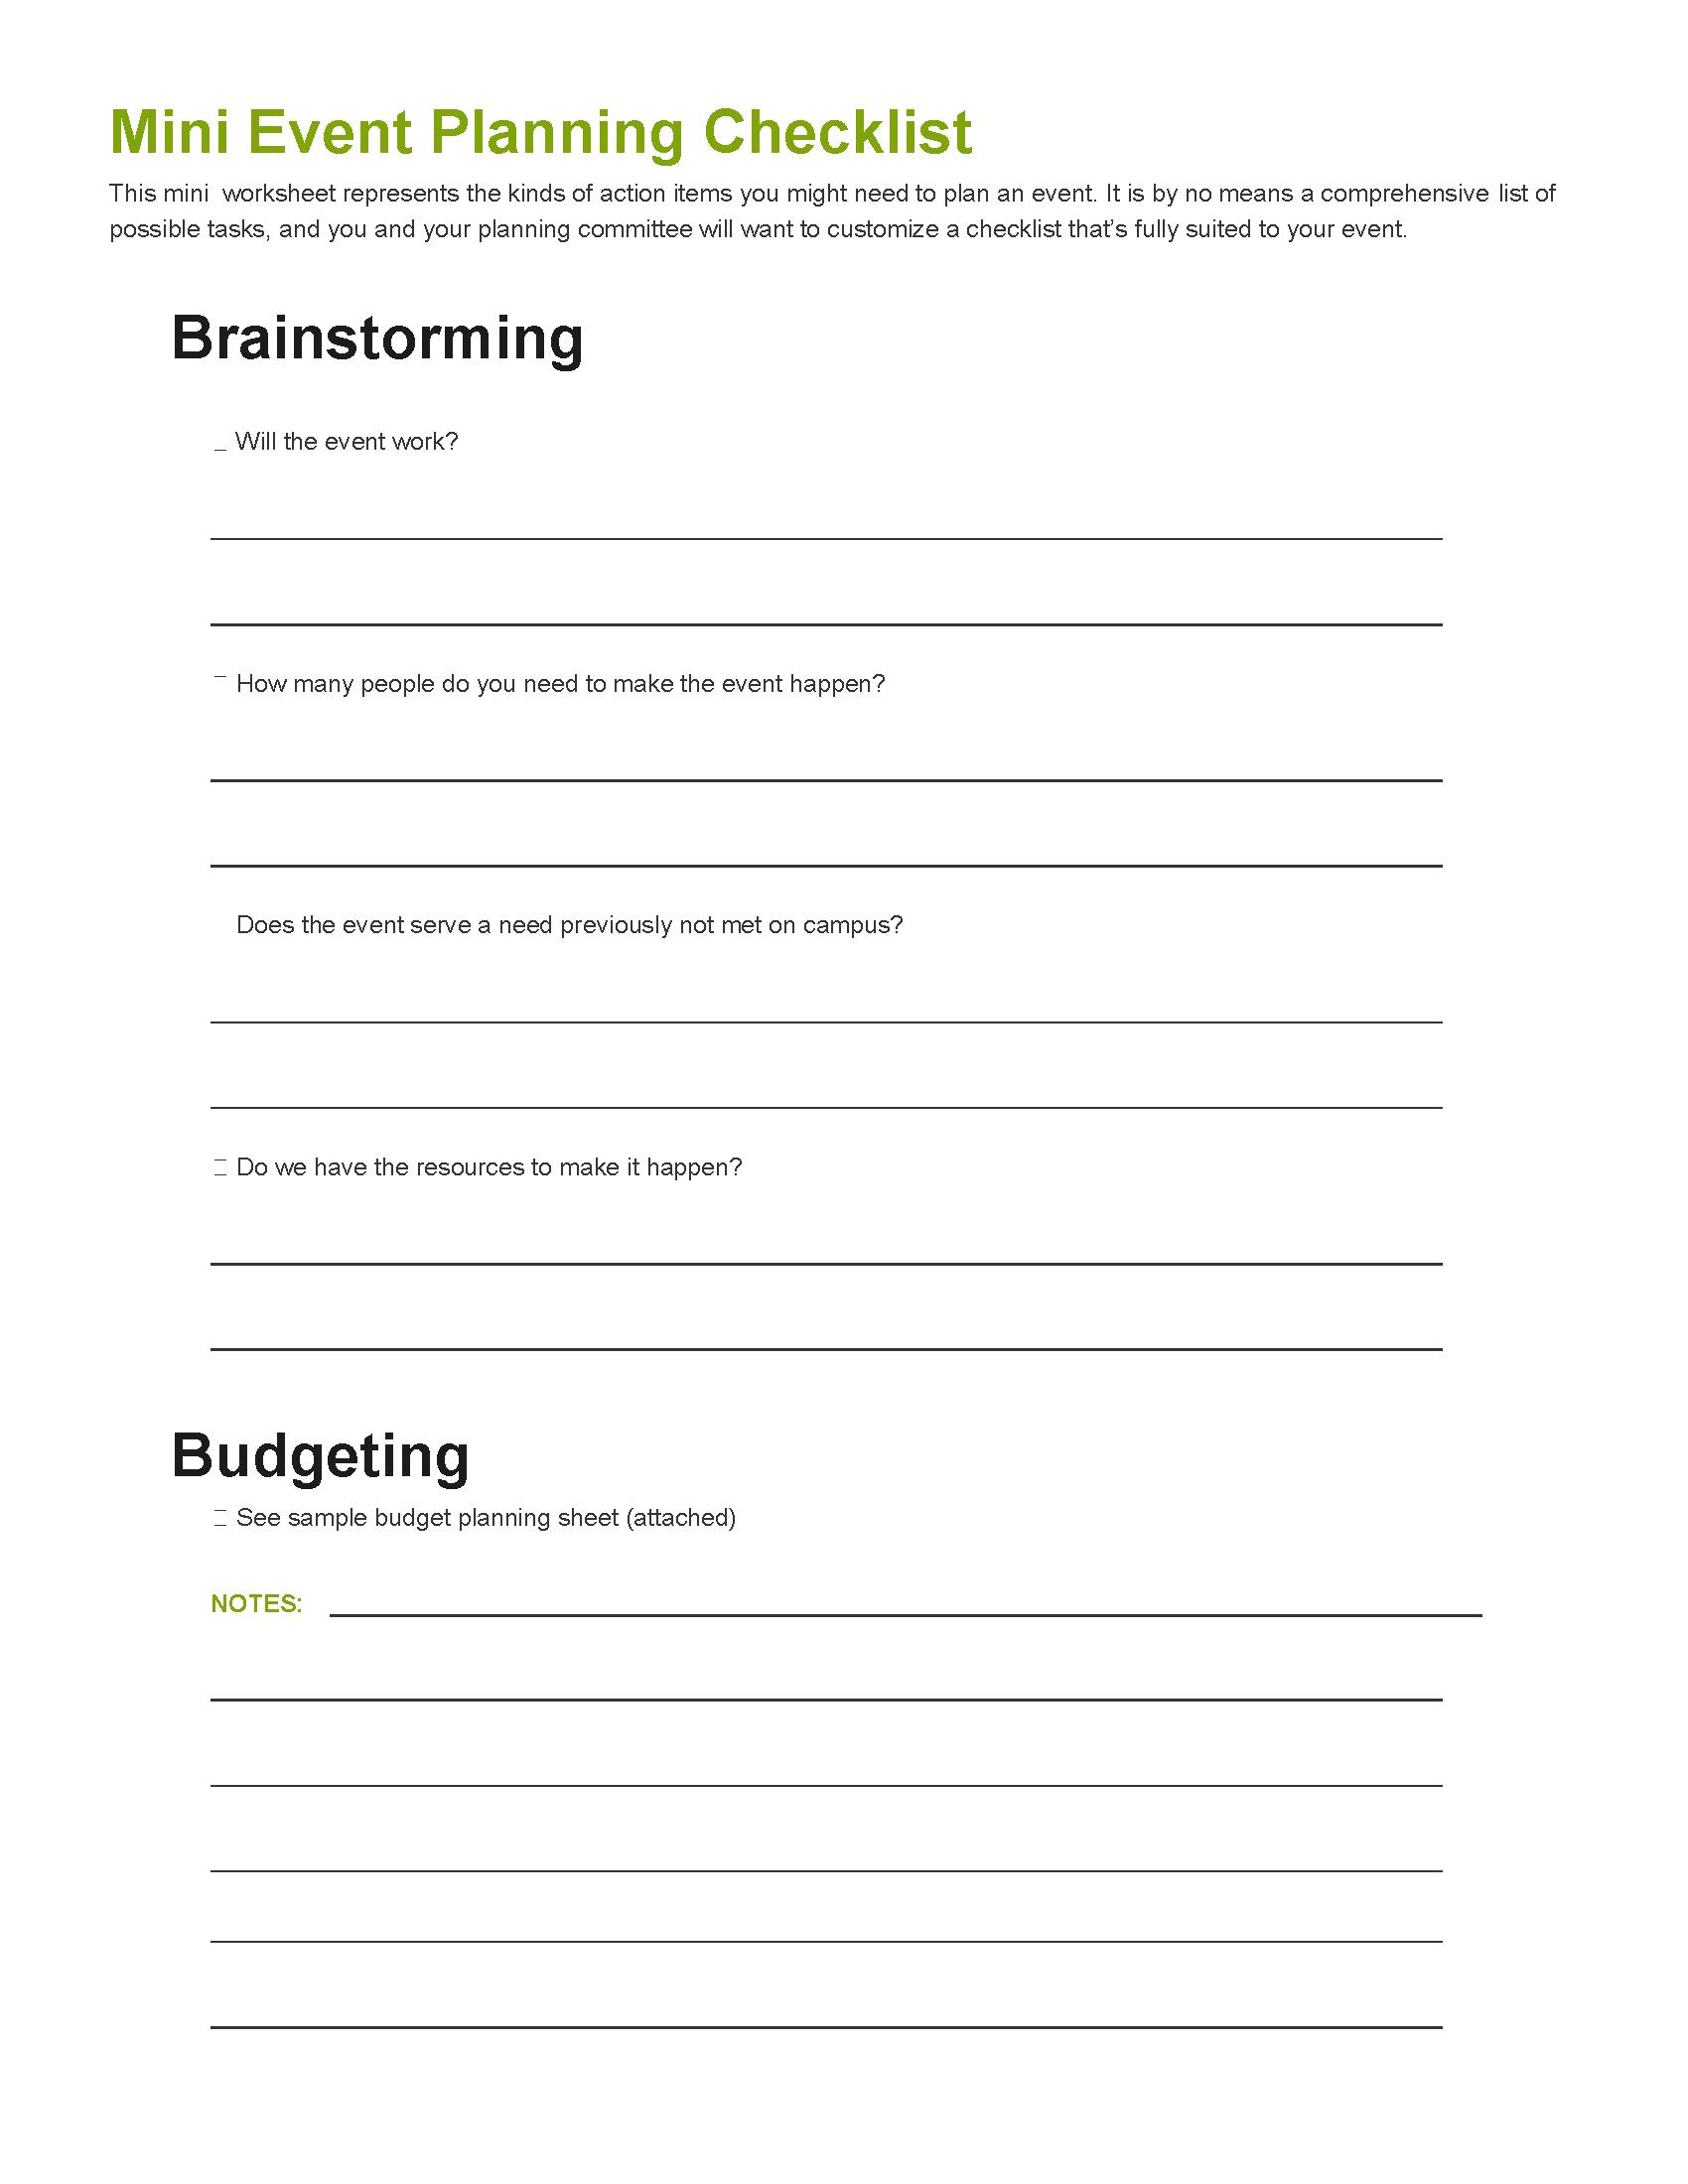 Mini Event Planning Guide Worksheet